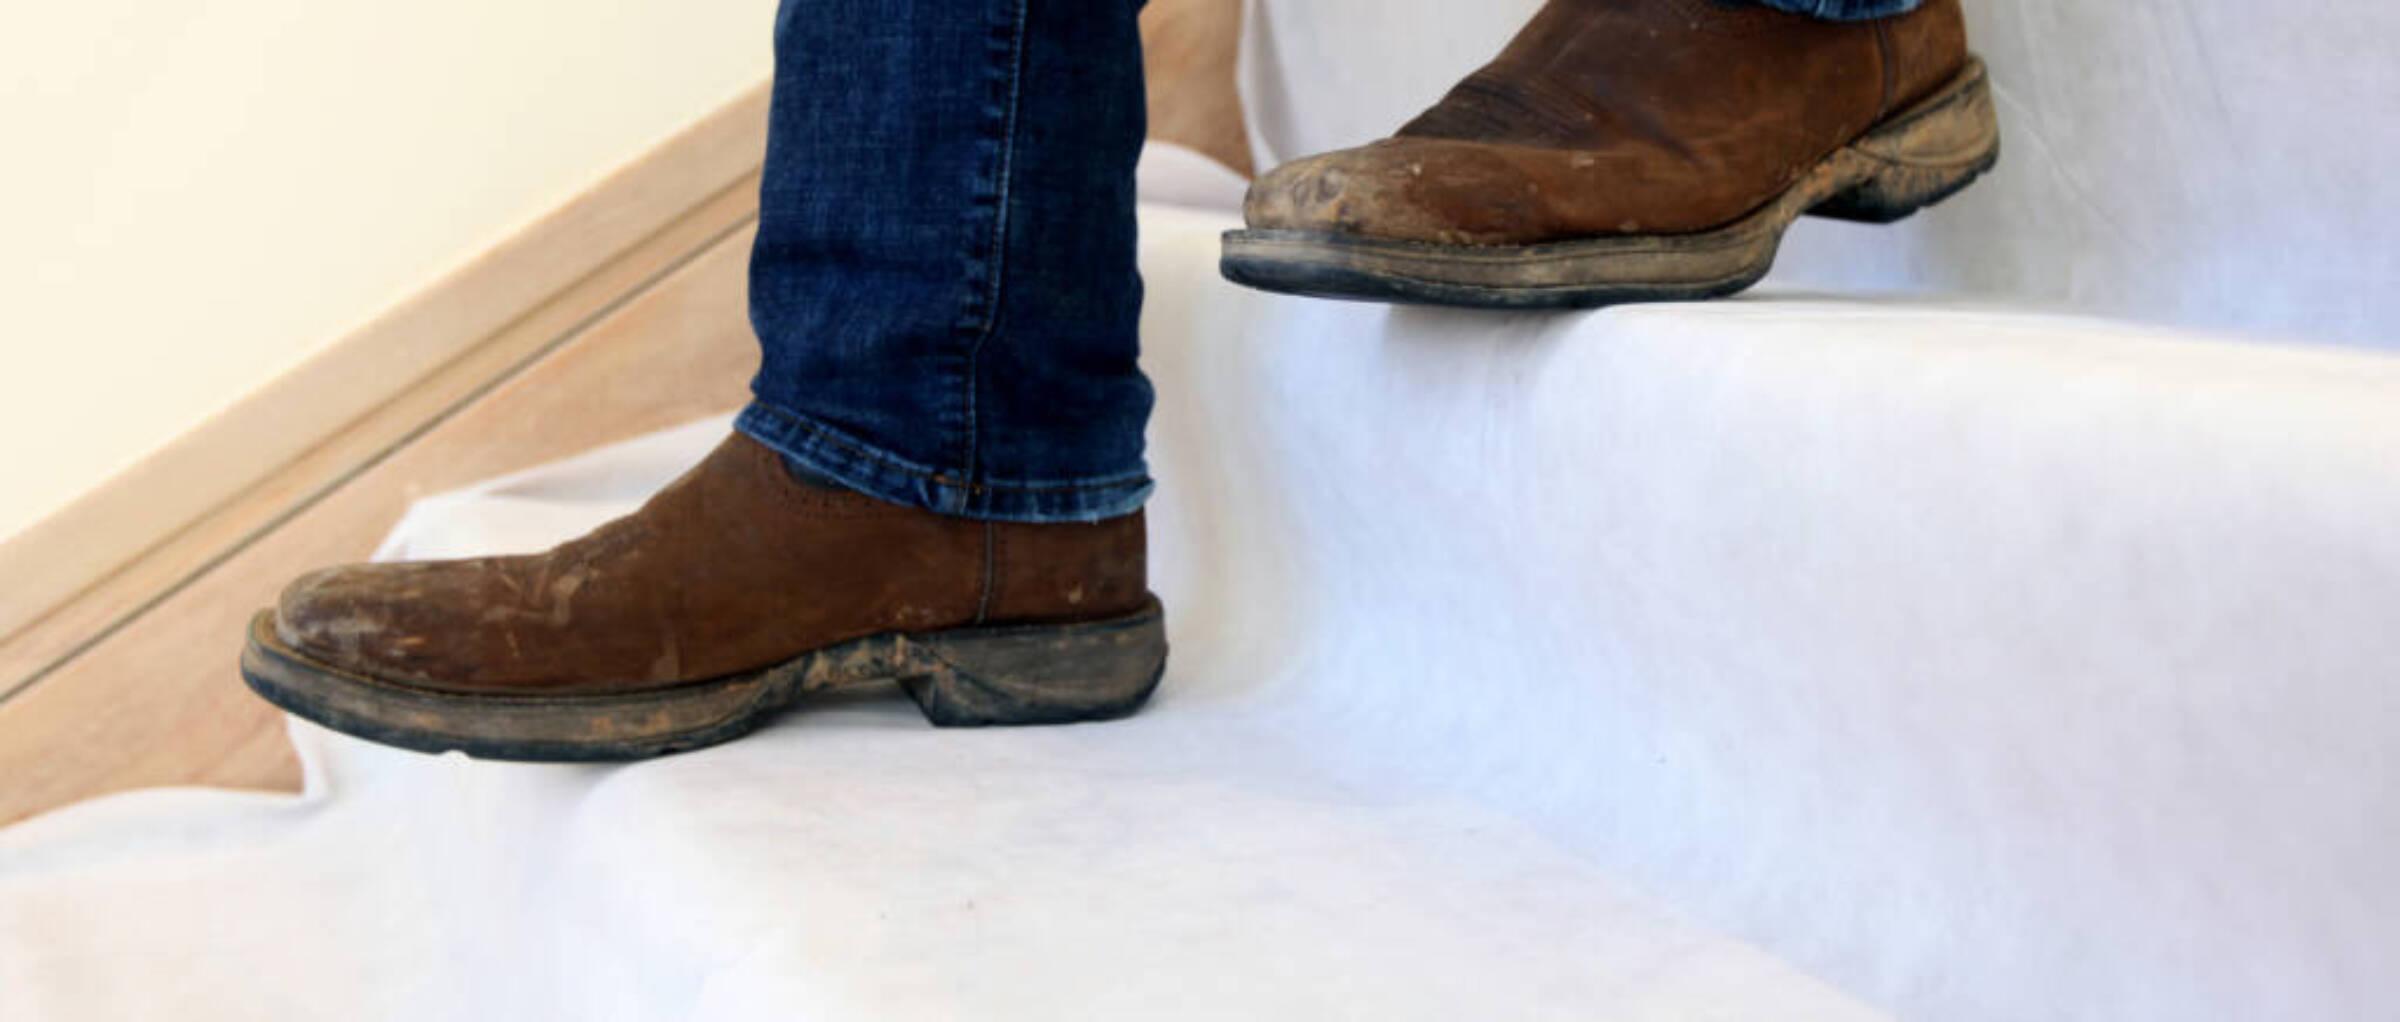 Smart Grip Slip Resistant Dropcloth